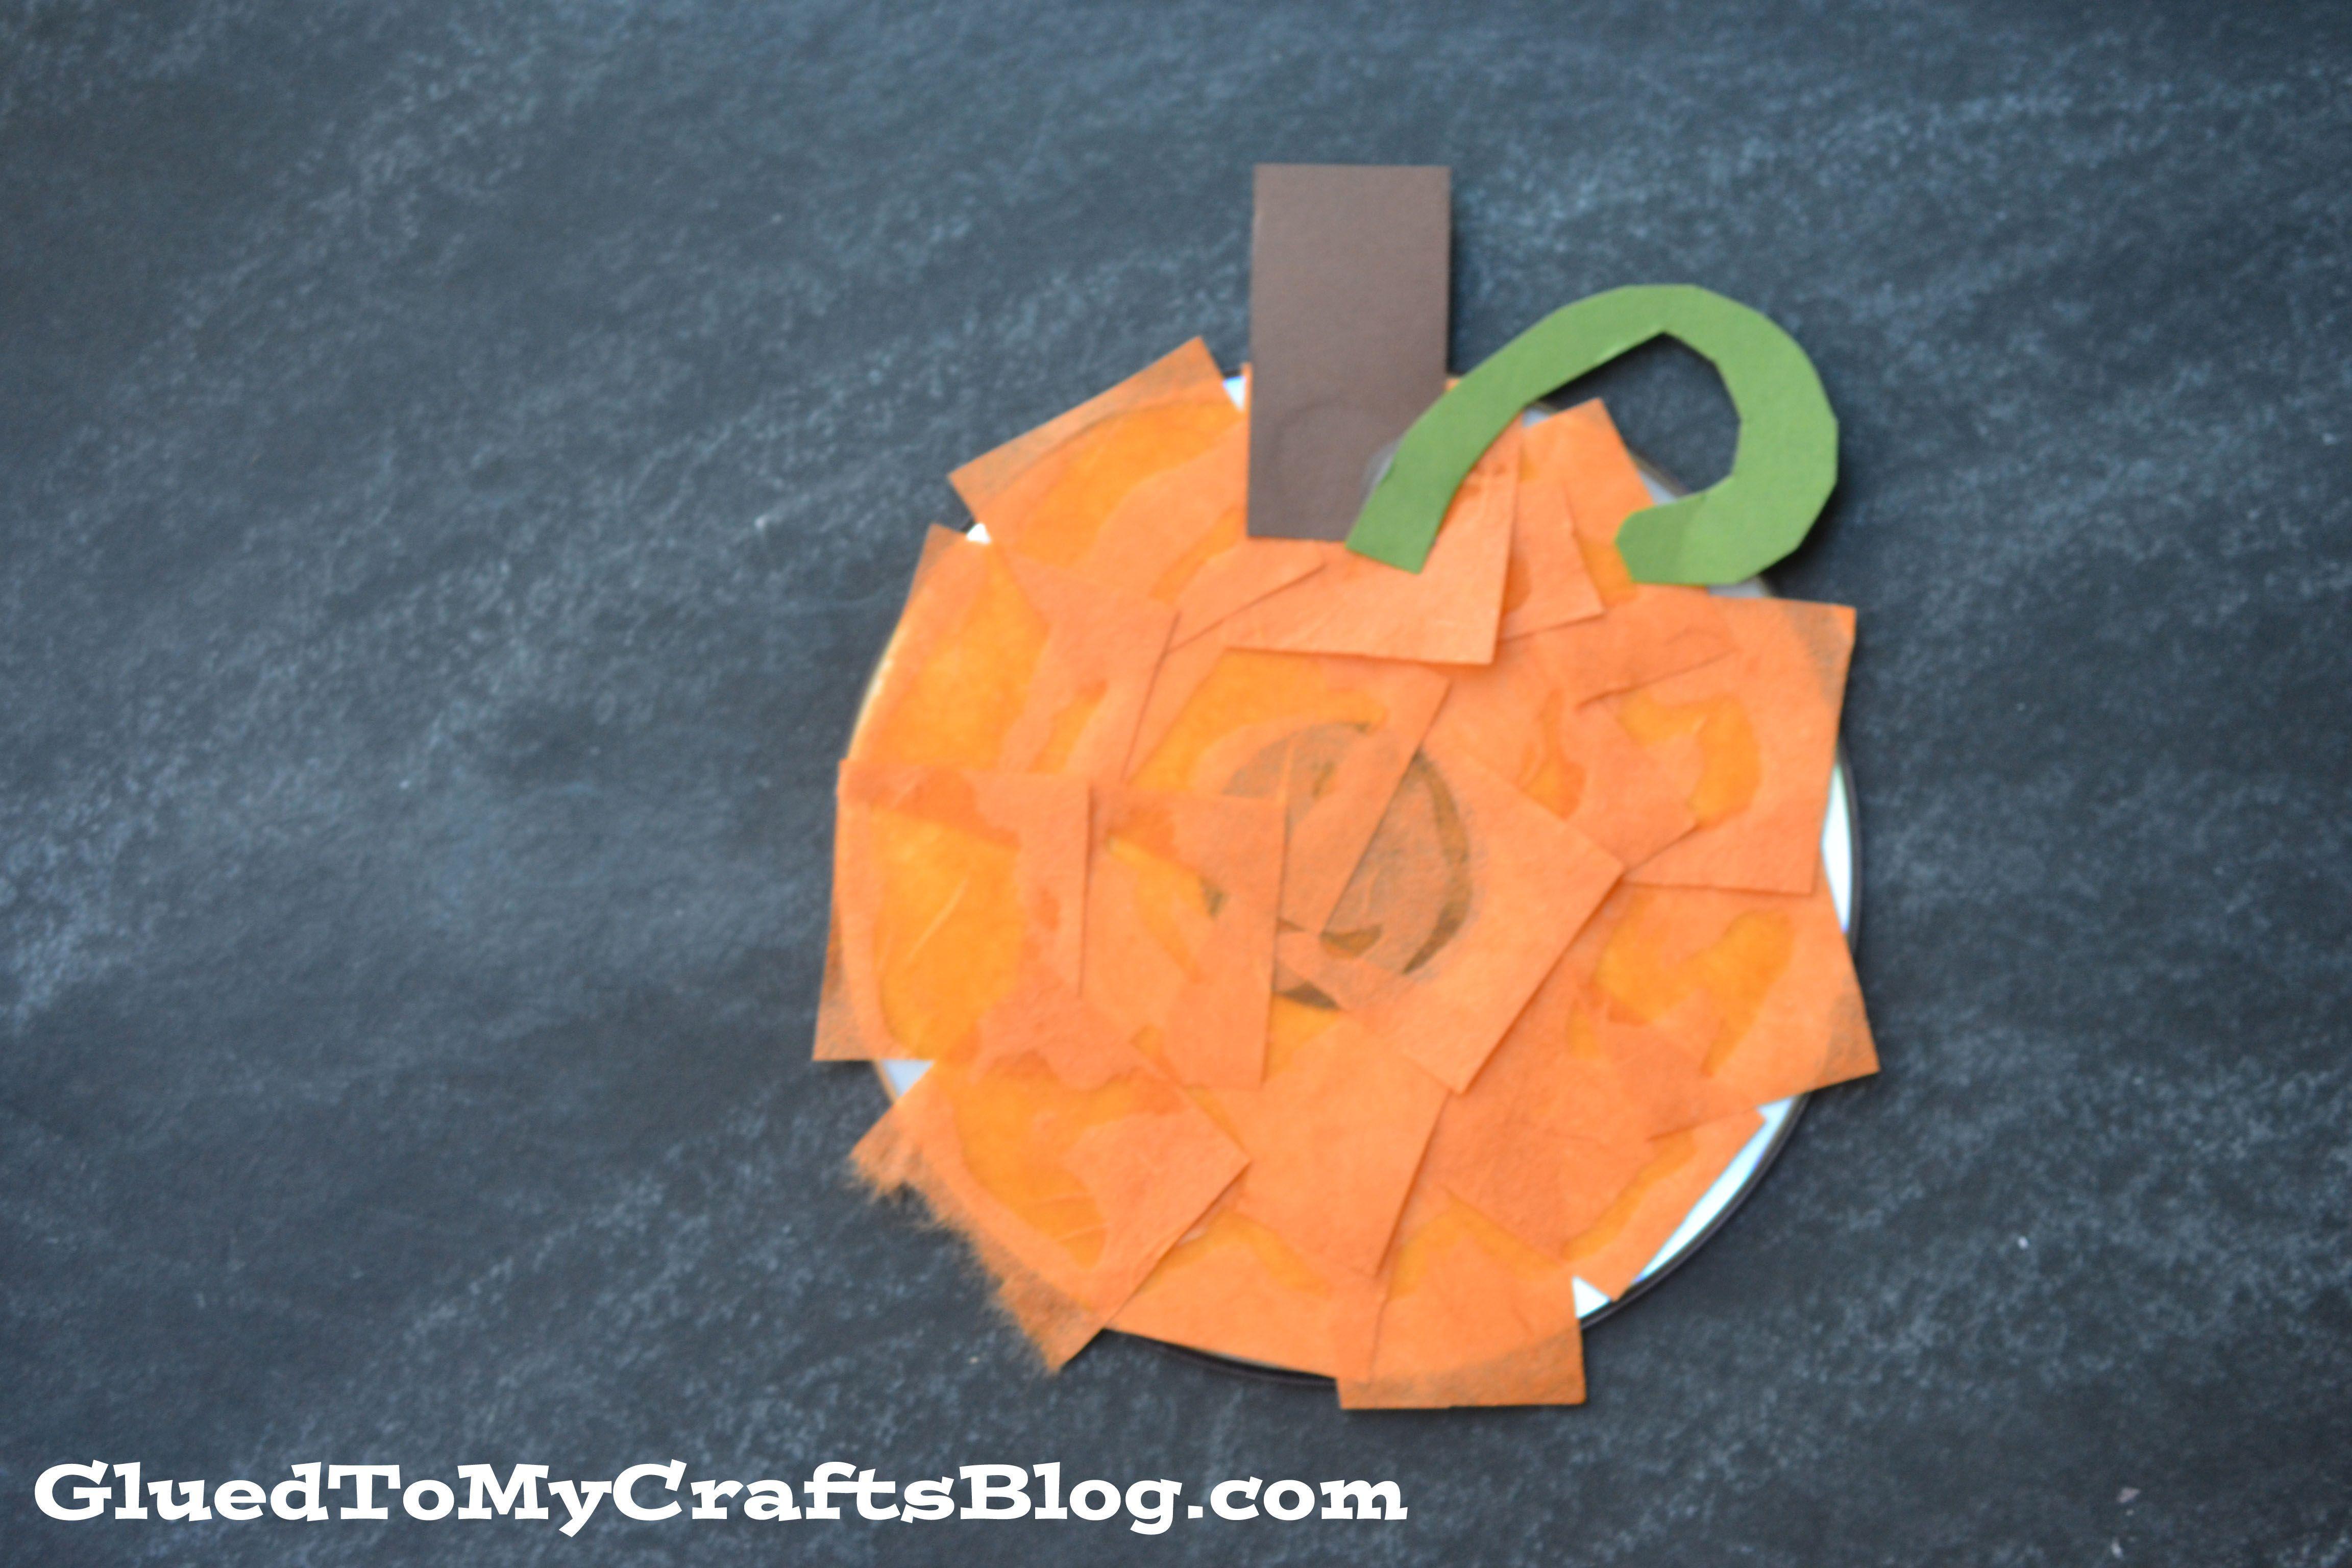 Recycled CD Pumpkin - Kid Craft #recycledcd Recycled CD Pumpkin - Kid Craft #recycledcd Recycled CD Pumpkin - Kid Craft #recycledcd Recycled CD Pumpkin - Kid Craft #recycledcd Recycled CD Pumpkin - Kid Craft #recycledcd Recycled CD Pumpkin - Kid Craft #recycledcd Recycled CD Pumpkin - Kid Craft #recycledcd Recycled CD Pumpkin - Kid Craft #recycledcd Recycled CD Pumpkin - Kid Craft #recycledcd Recycled CD Pumpkin - Kid Craft #recycledcd Recycled CD Pumpkin - Kid Craft #recycledcd Recycled CD Pump #recycledcd